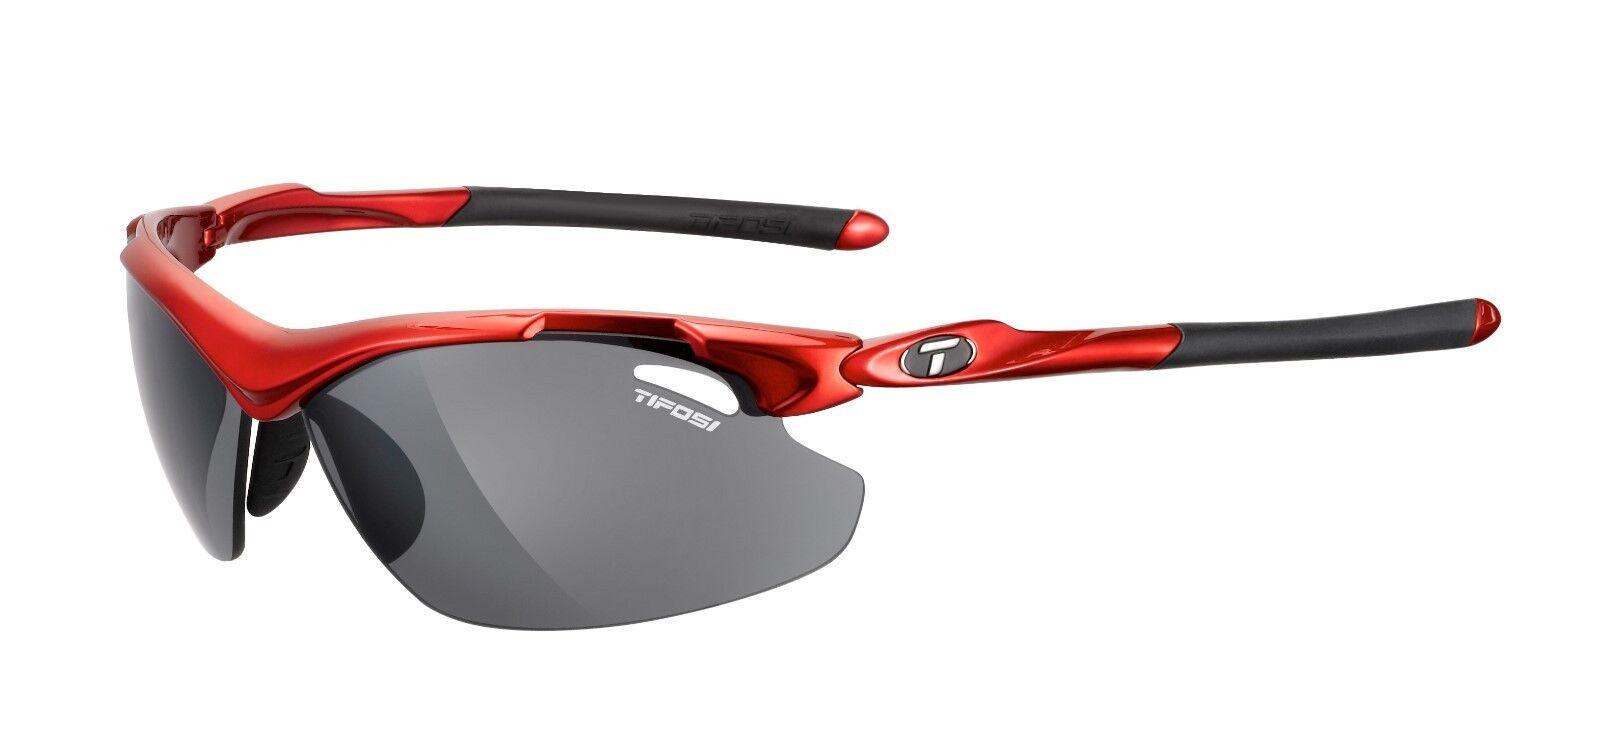 TifosiTYRANT2.0 Metallic Red CYCLING Sunglasses